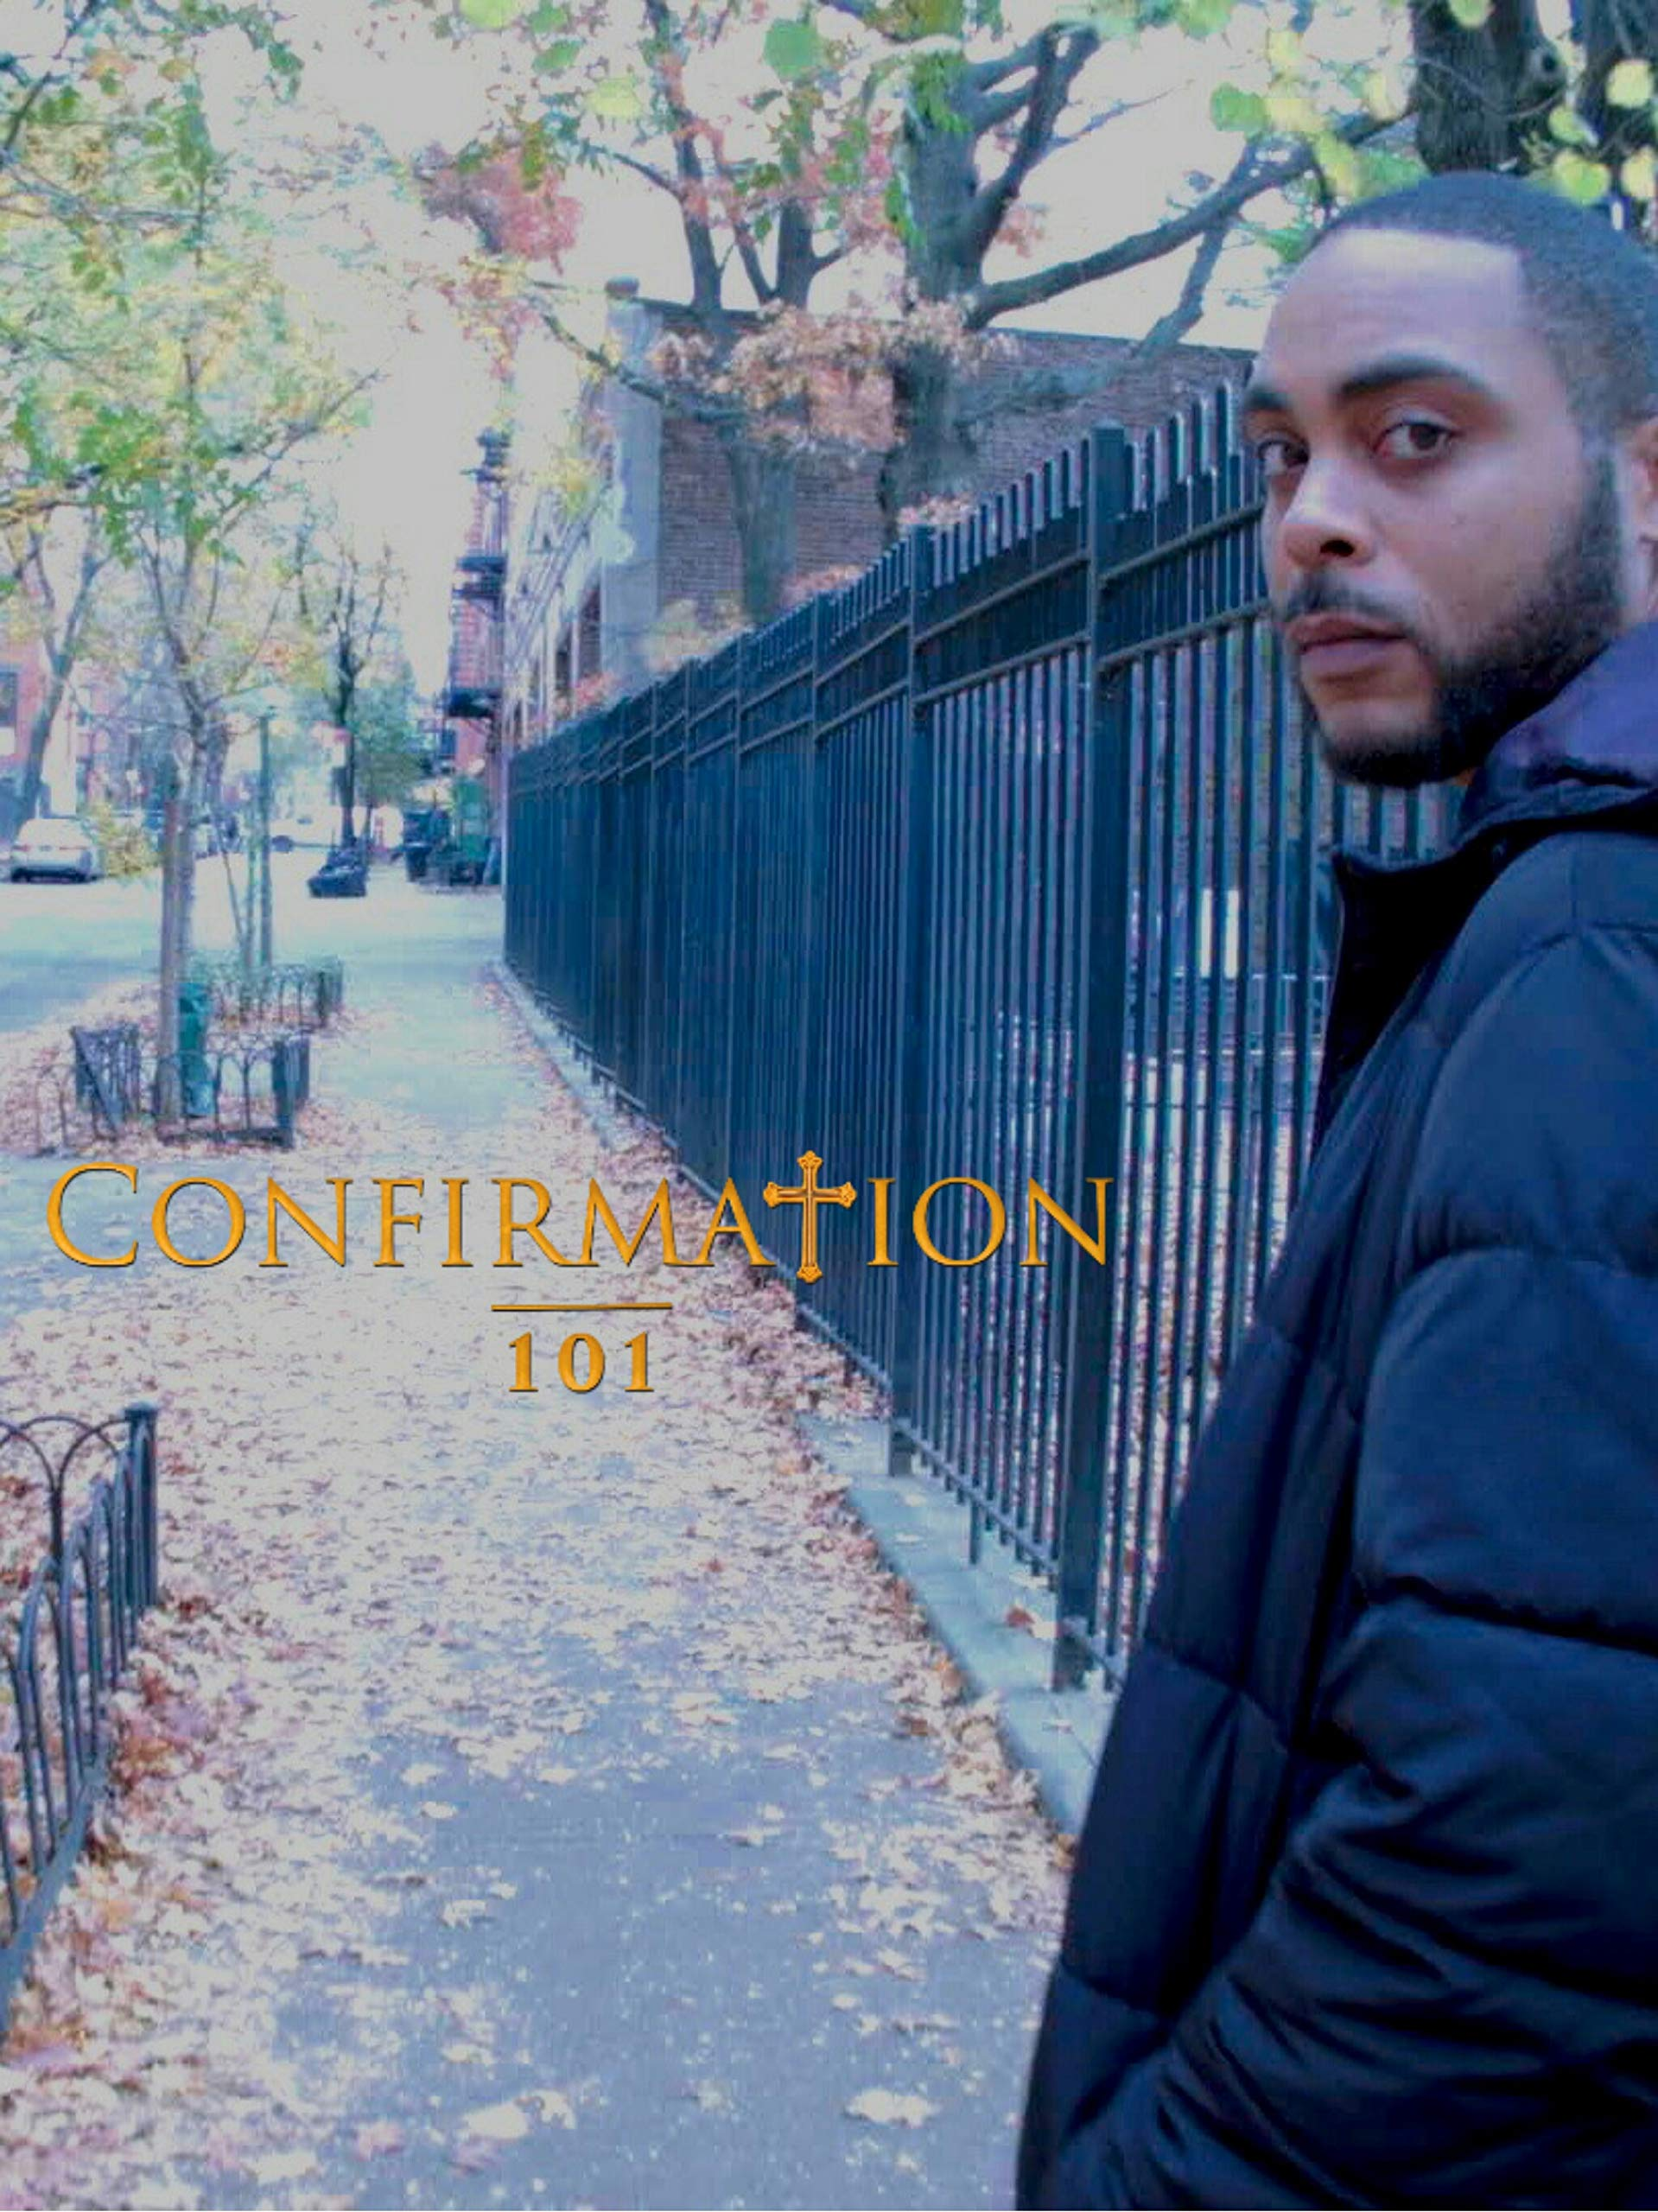 Confirmation 101